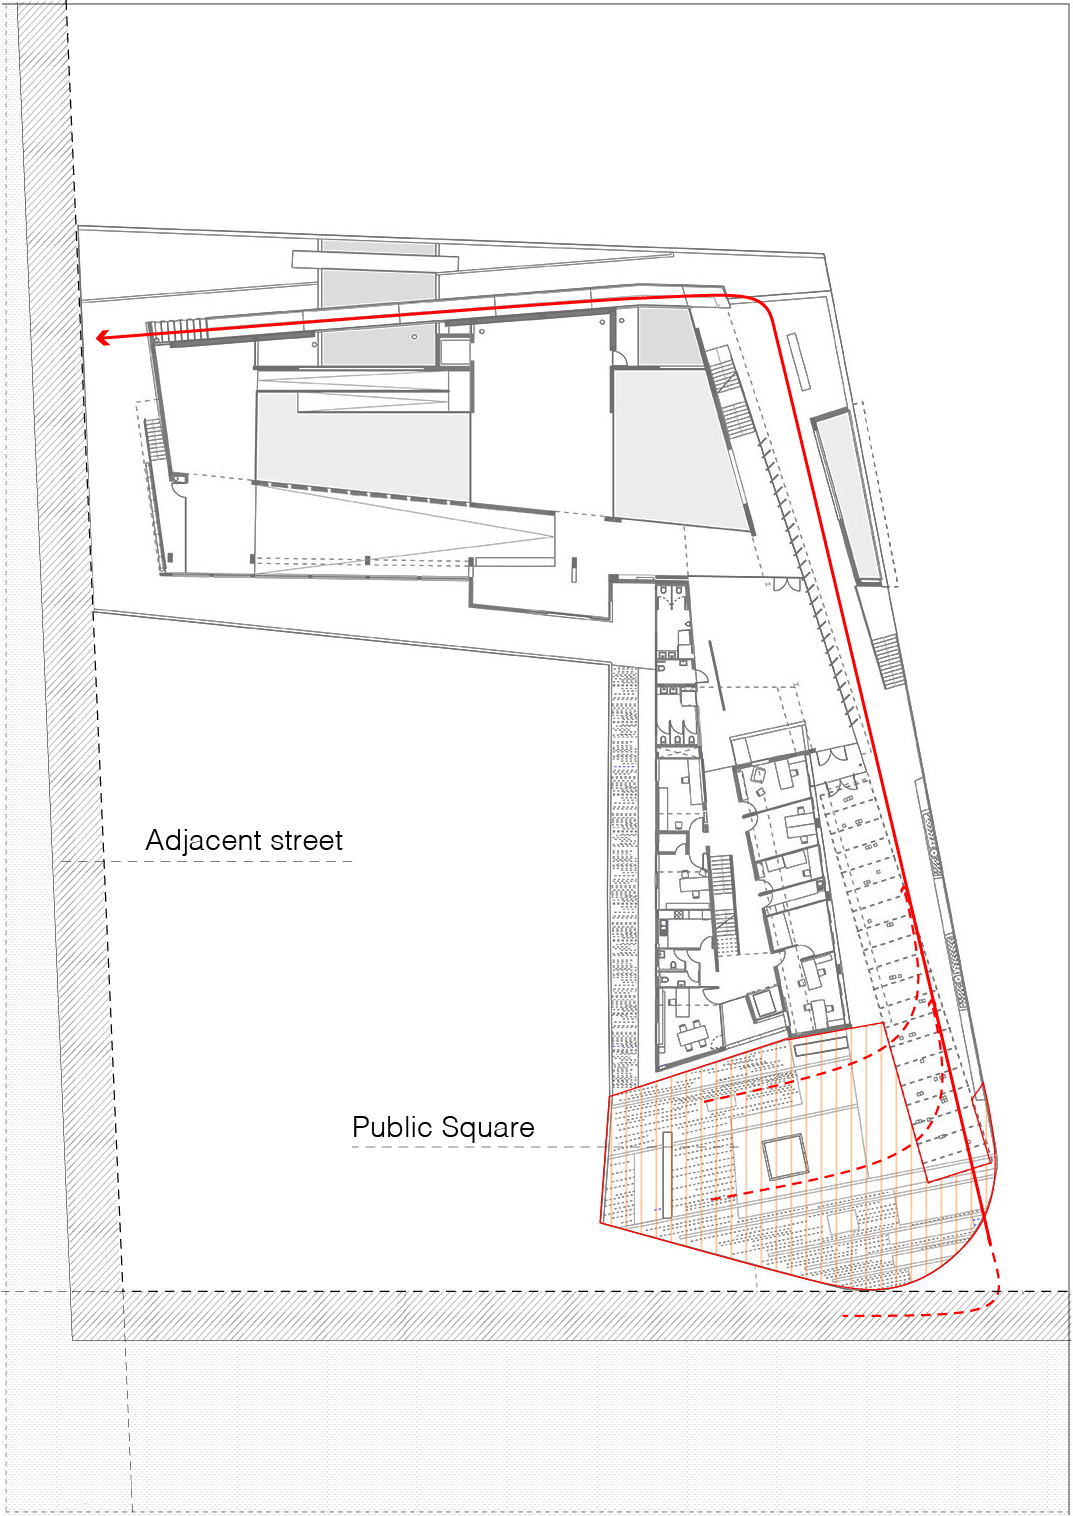 Exterior circulation - public flow through the site